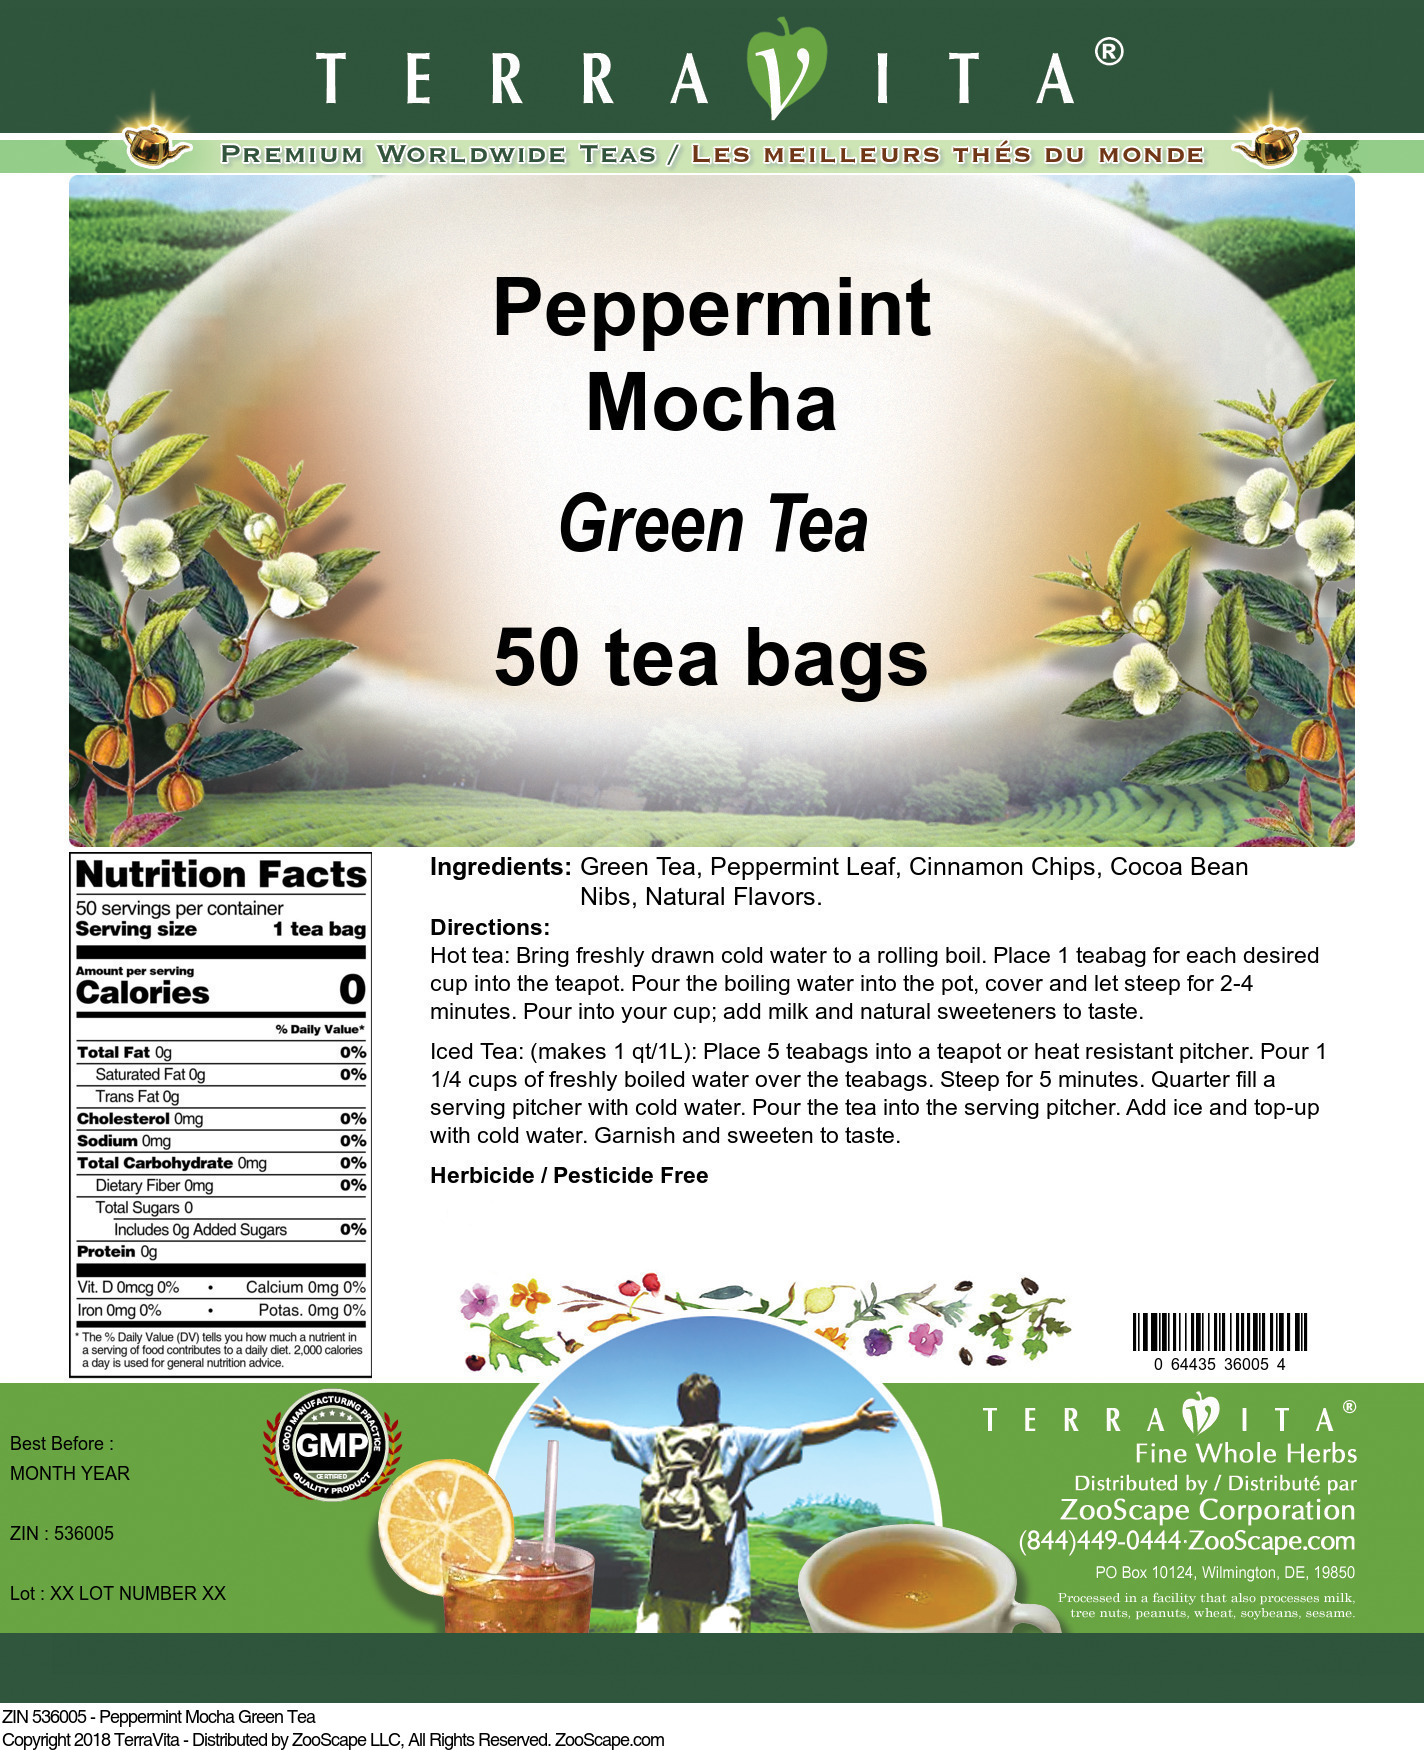 Peppermint Mocha Green Tea